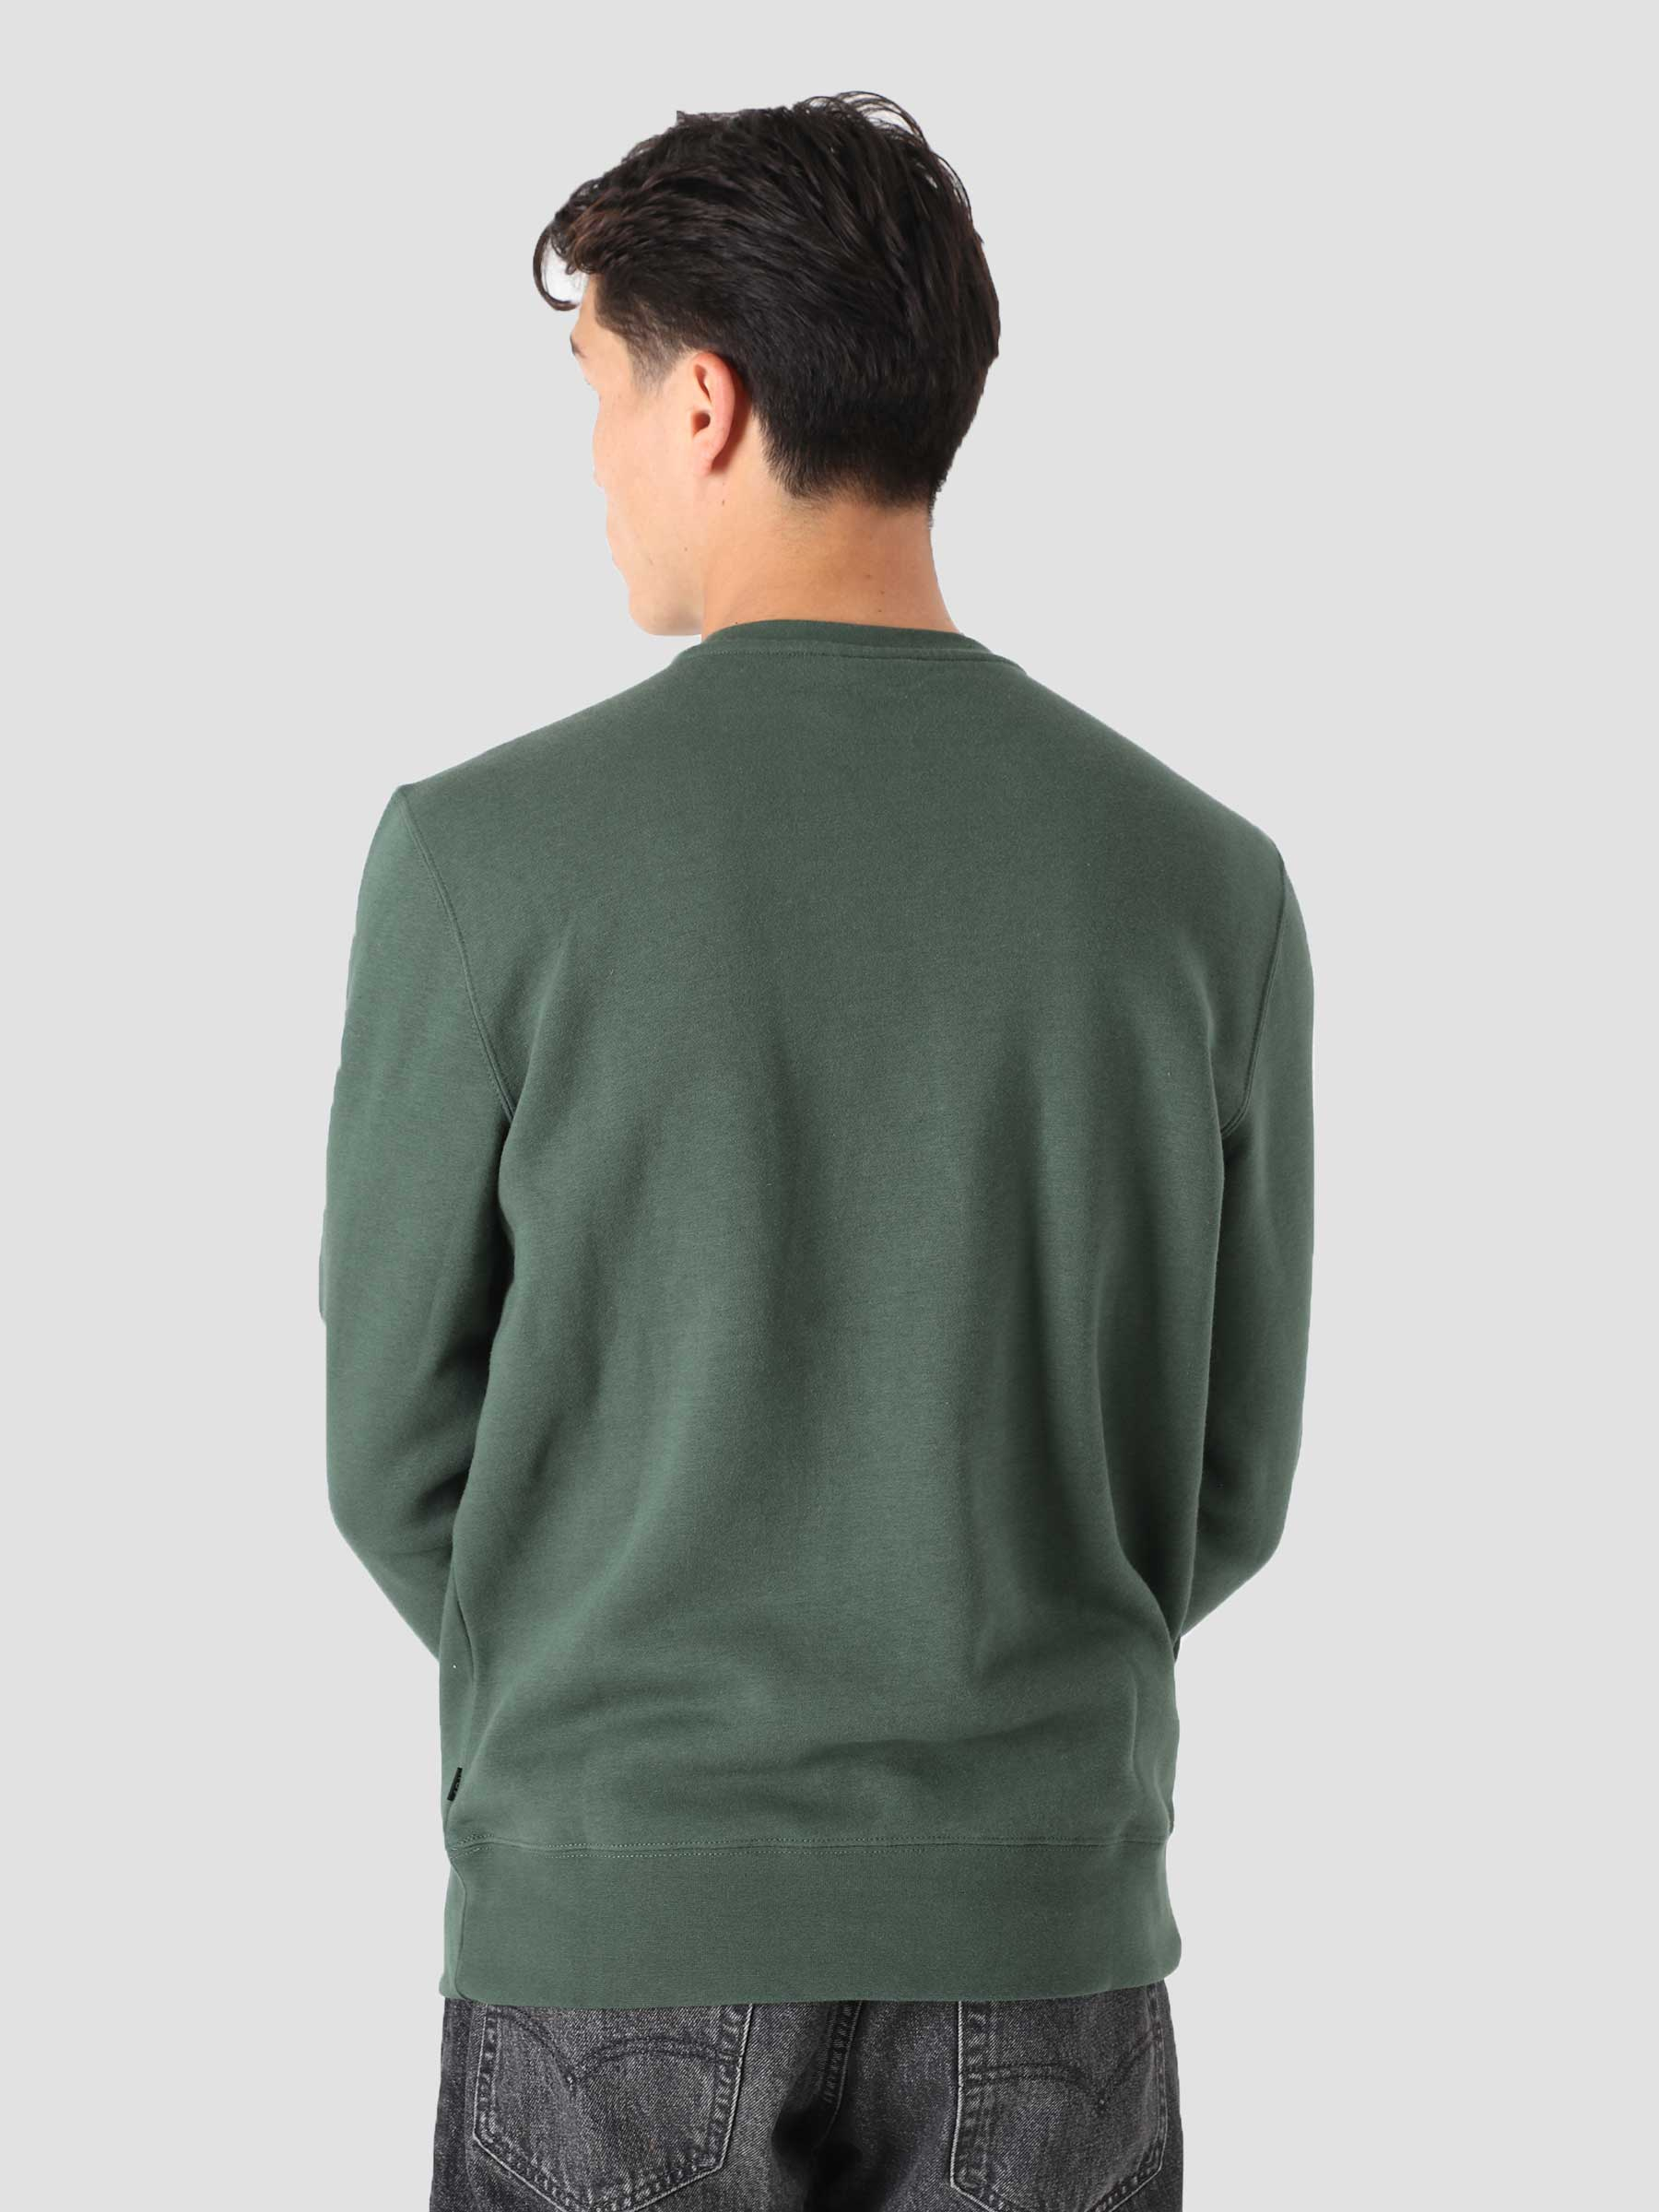 Roasted Crewneck Sweater Dark Green PF00391-DKGRN